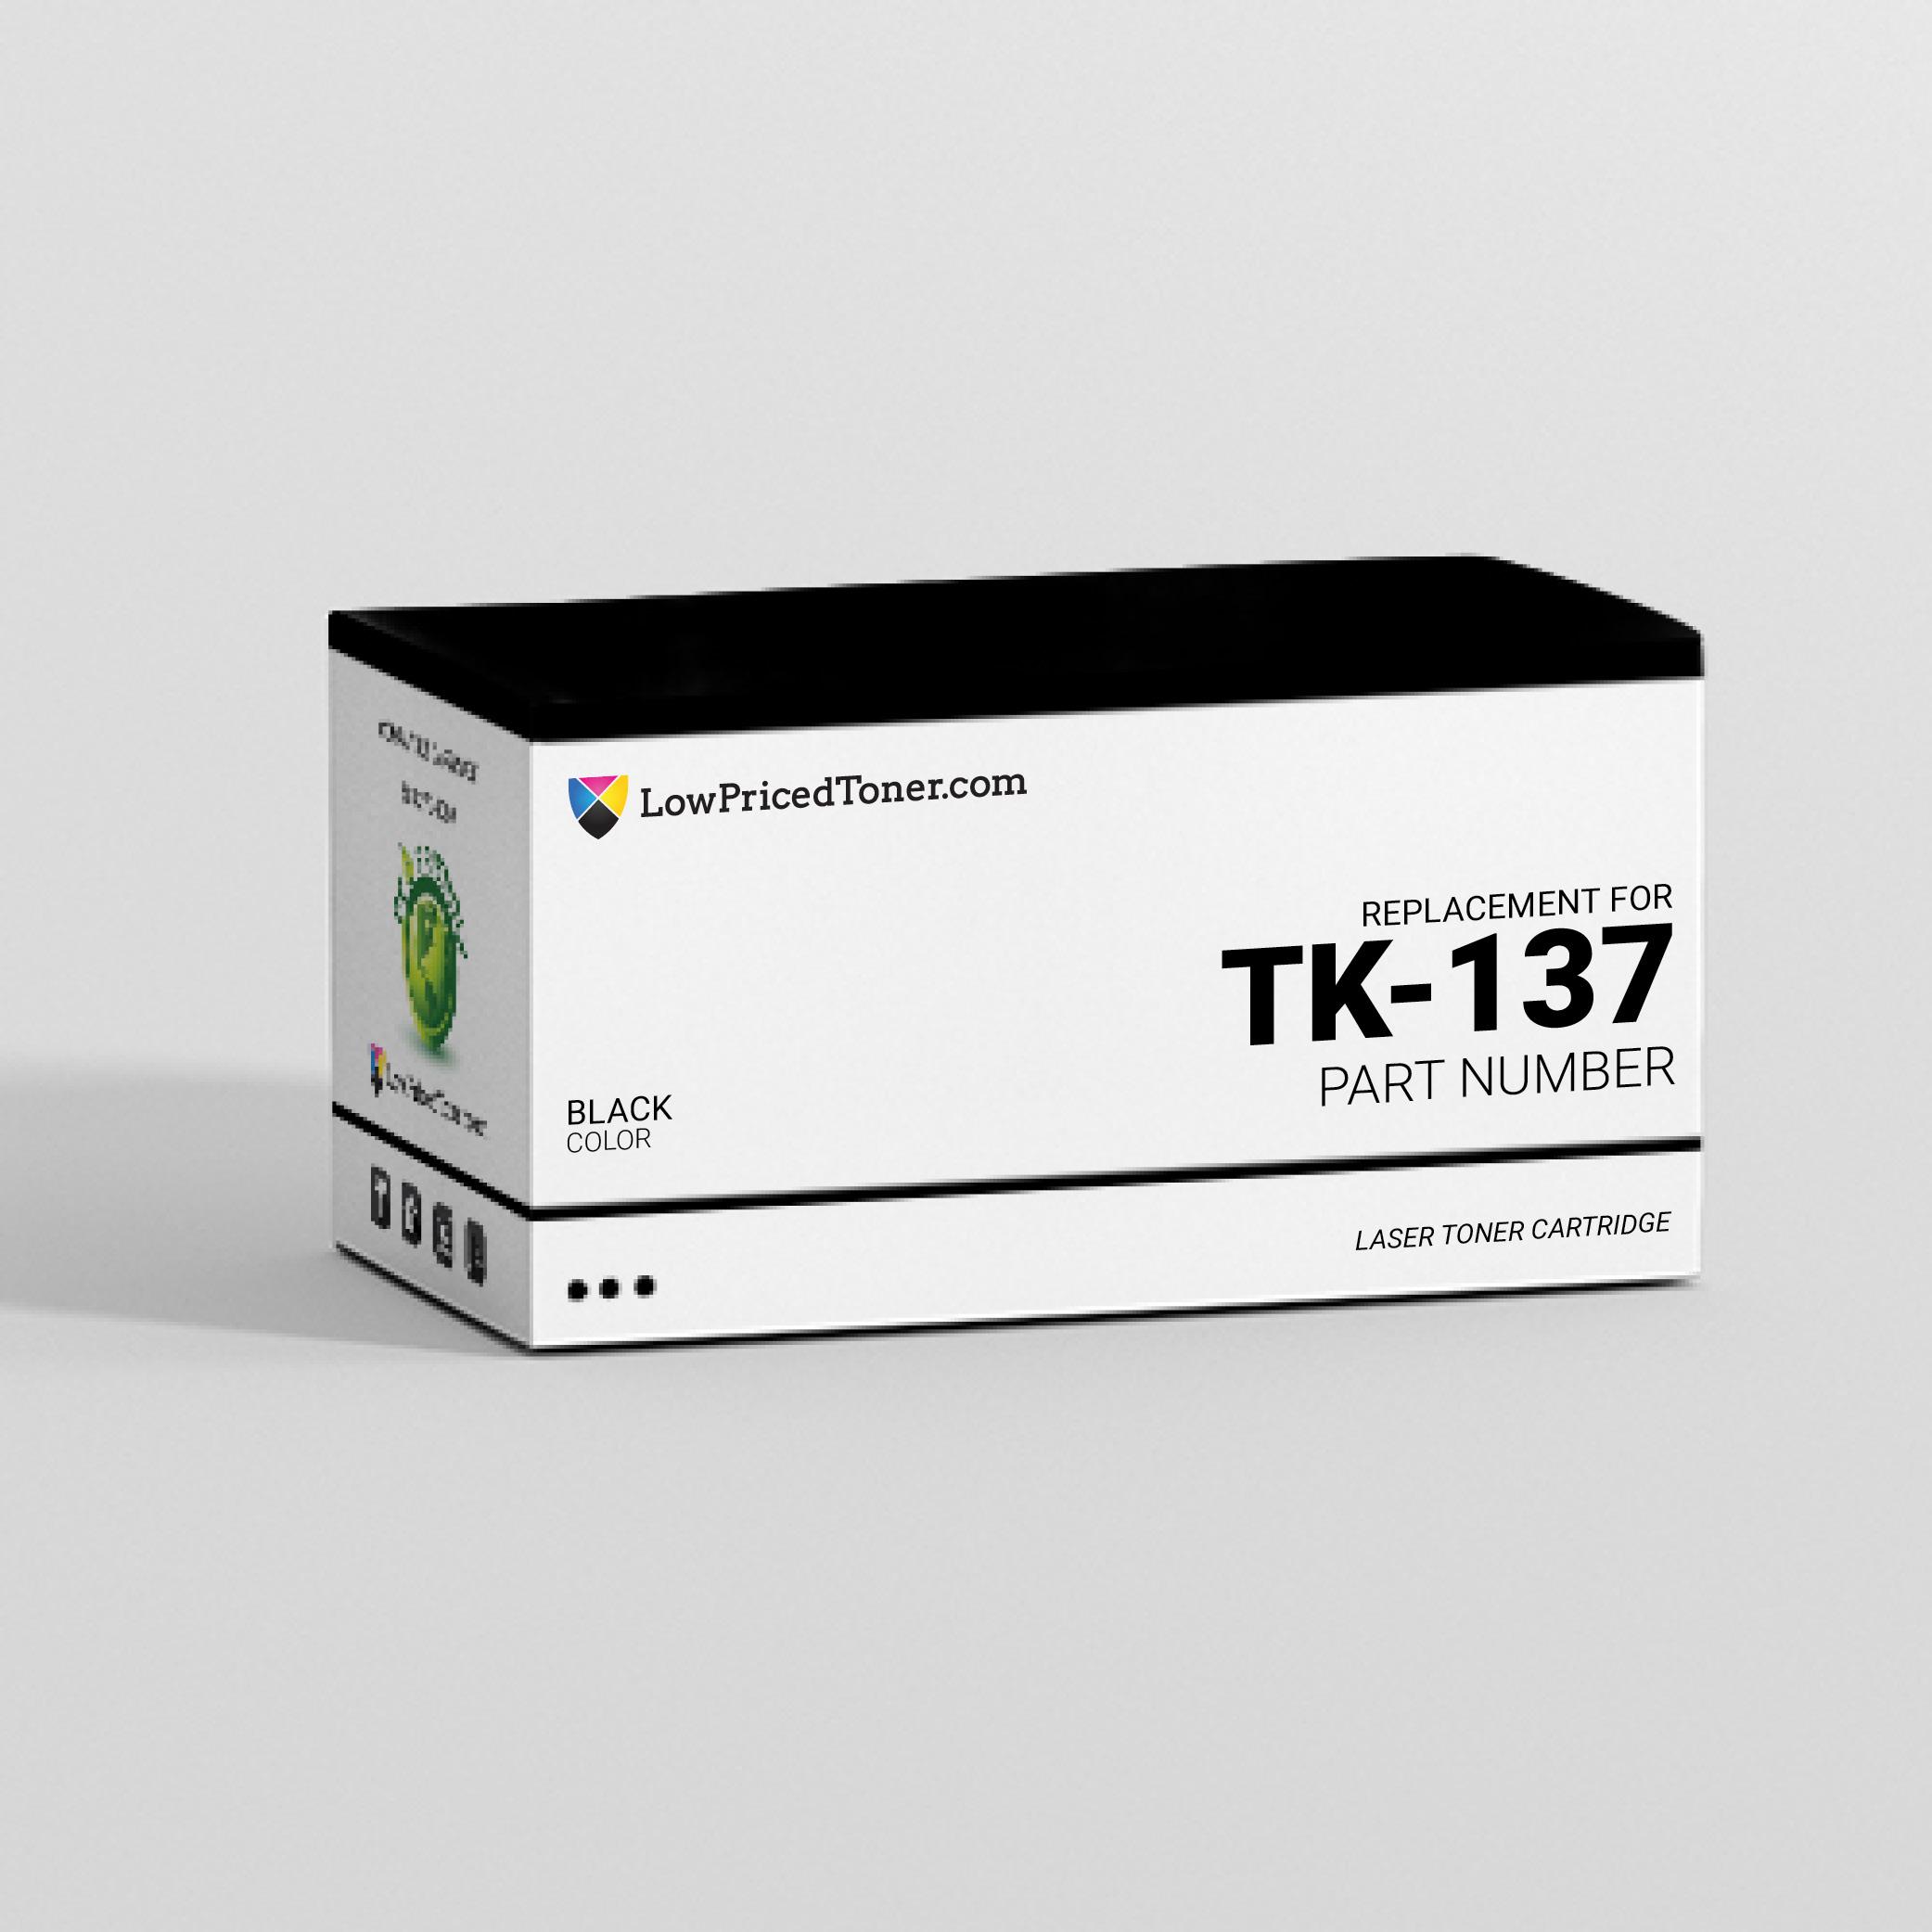 Kyocera Mita TK-137 Compatible Black Laser Toner Cartridge